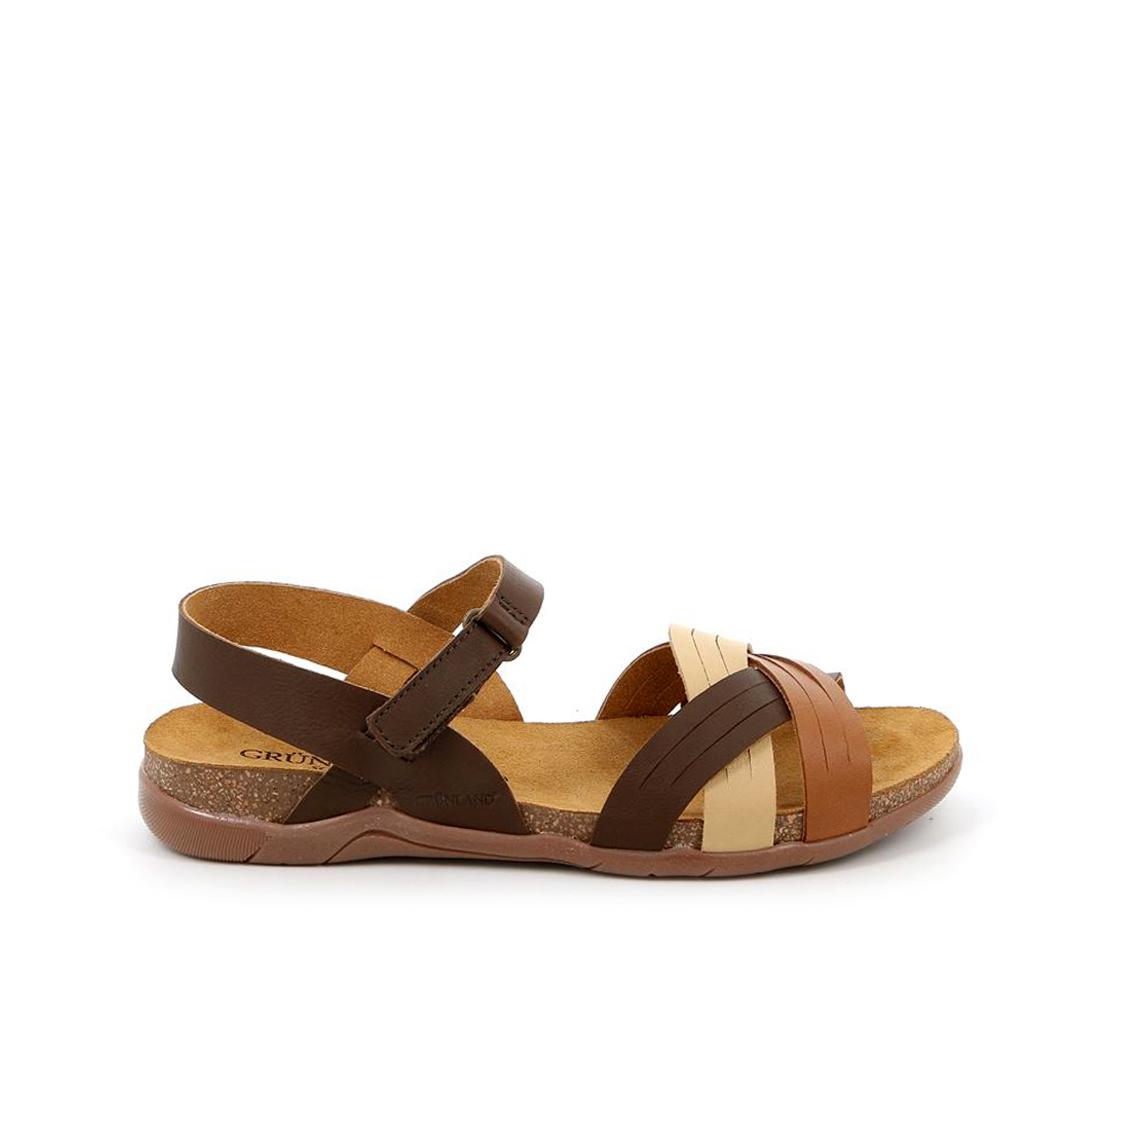 Sandalo t.moro Grunland